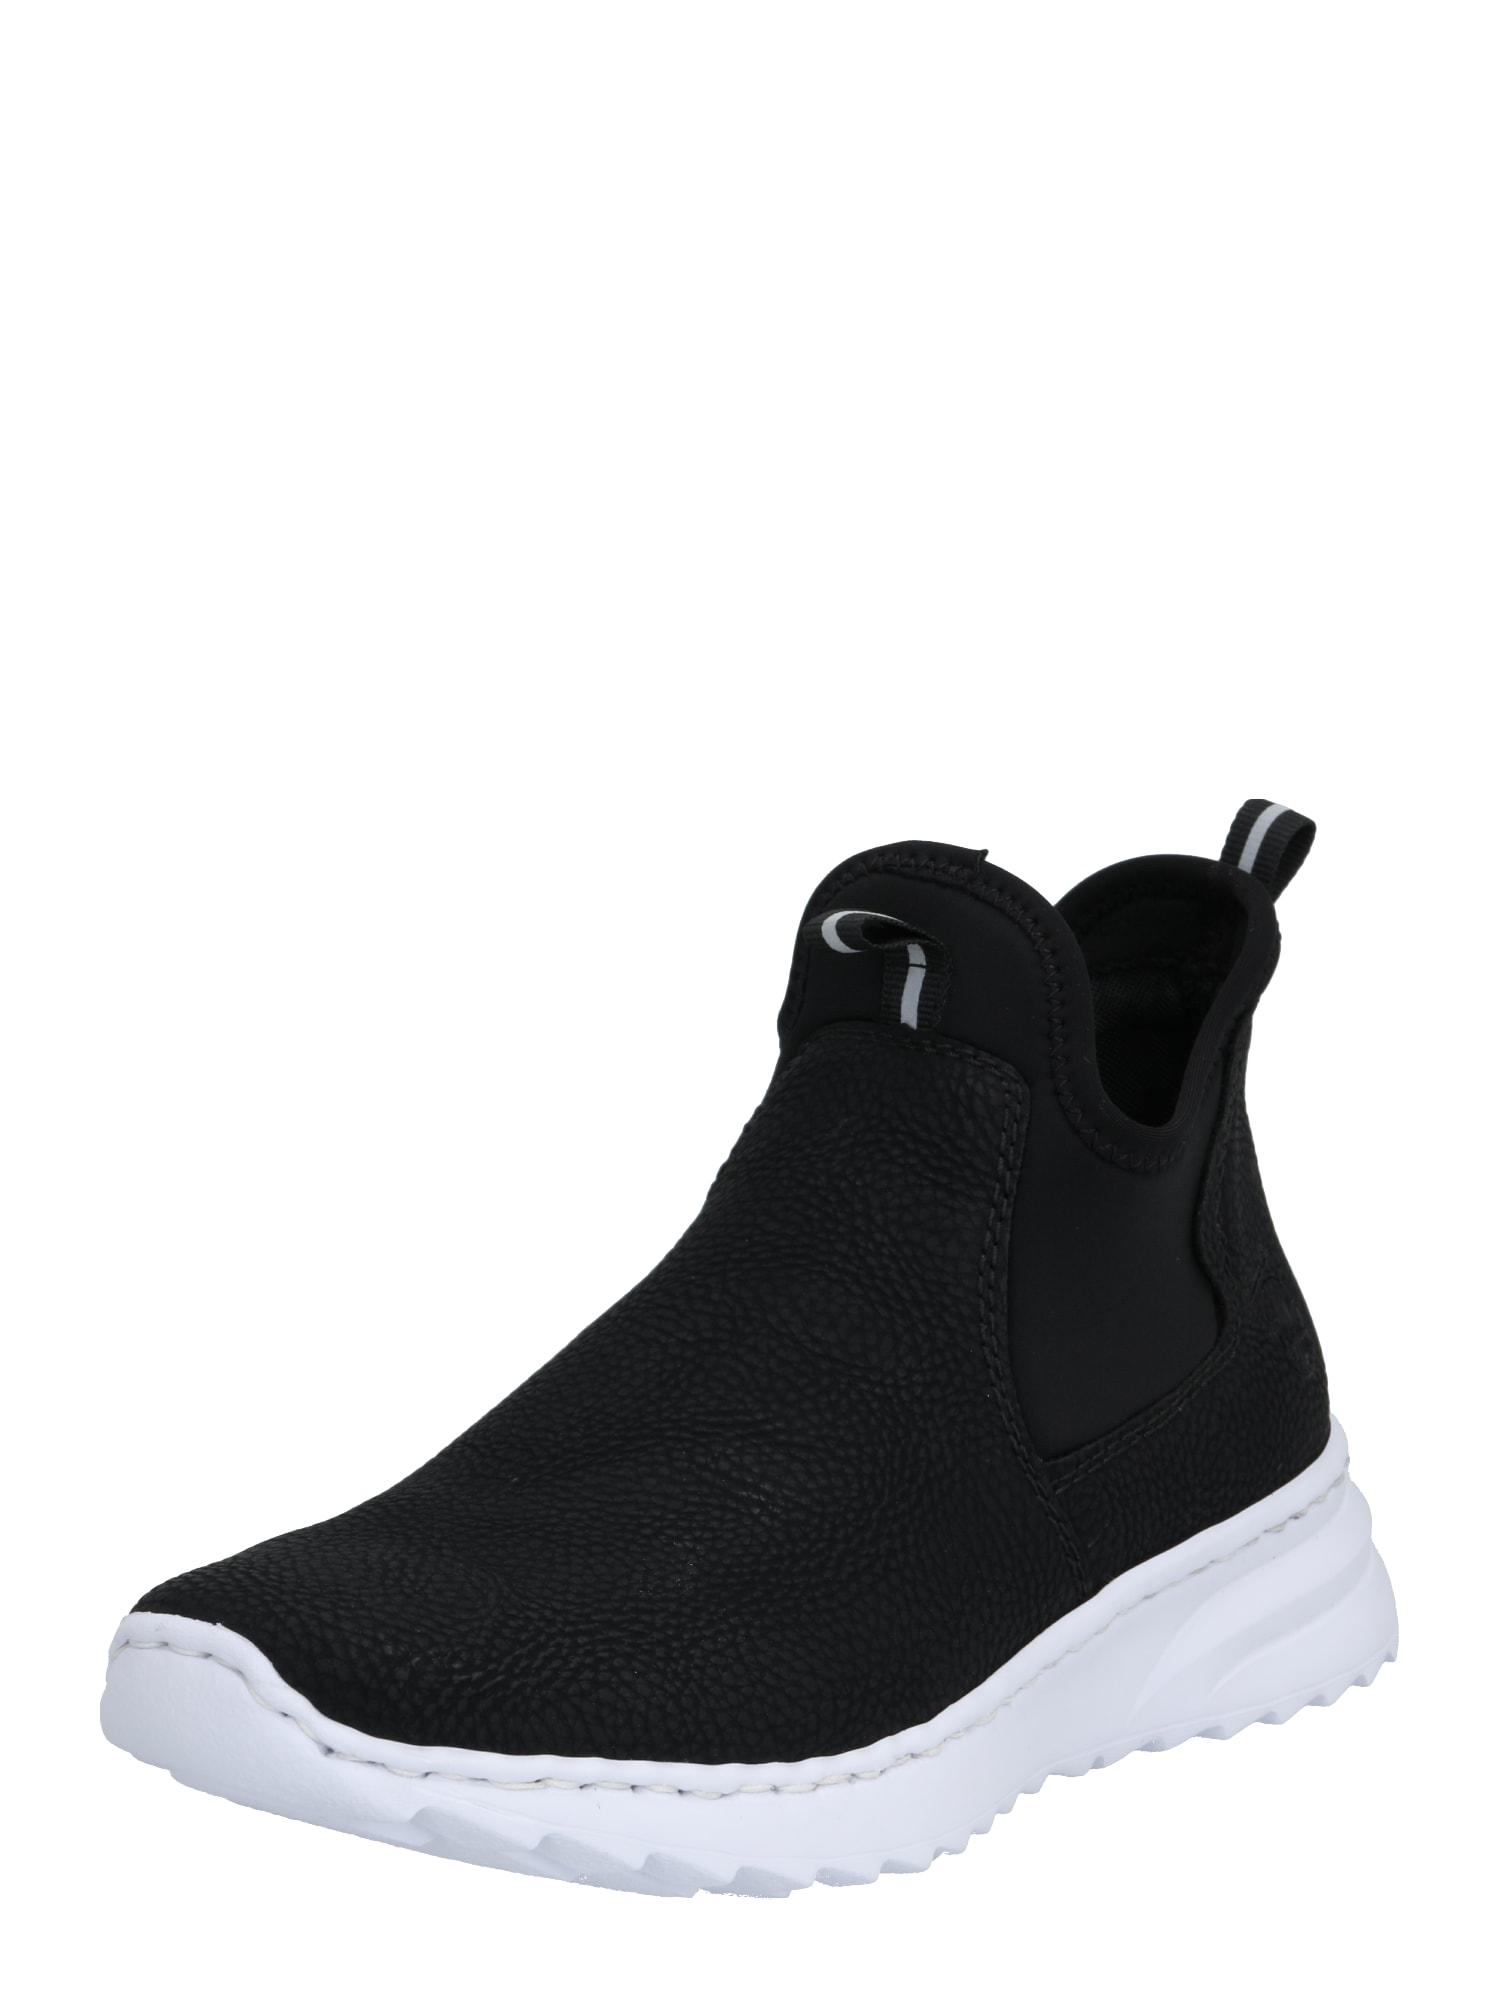 RIEKER Členkové tenisky  biela / čierna